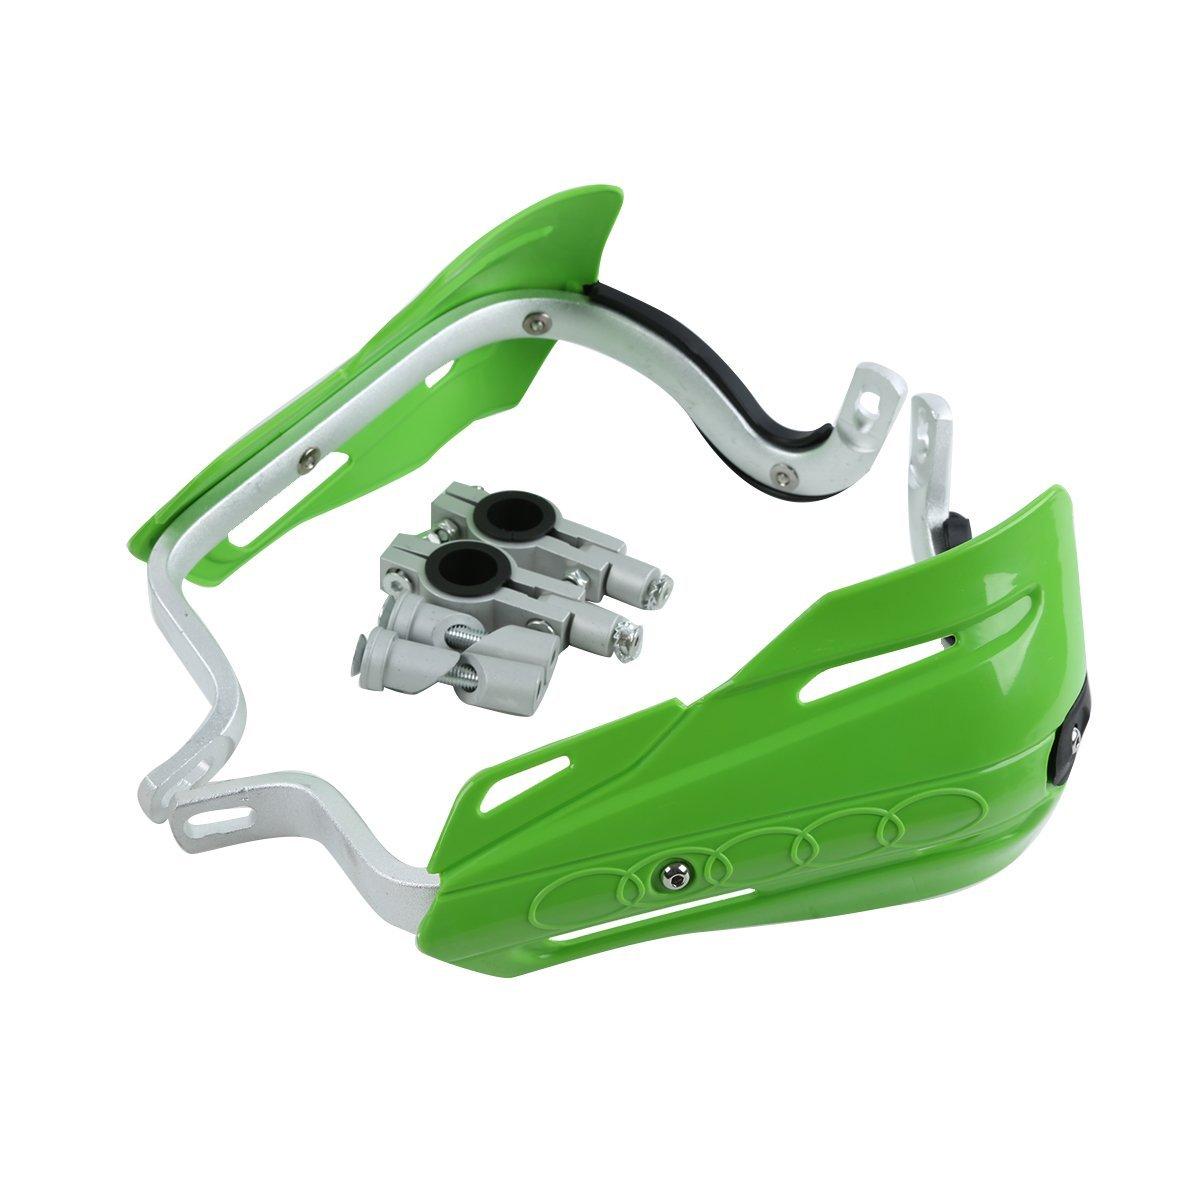 "XFMT Motorcycle Green 7/8""(22m) Universal Hand Guards Brush Bar Handguards For Honda Kawasaki Yamaha Suzuki Dirt Bike ATVs MX KTM"